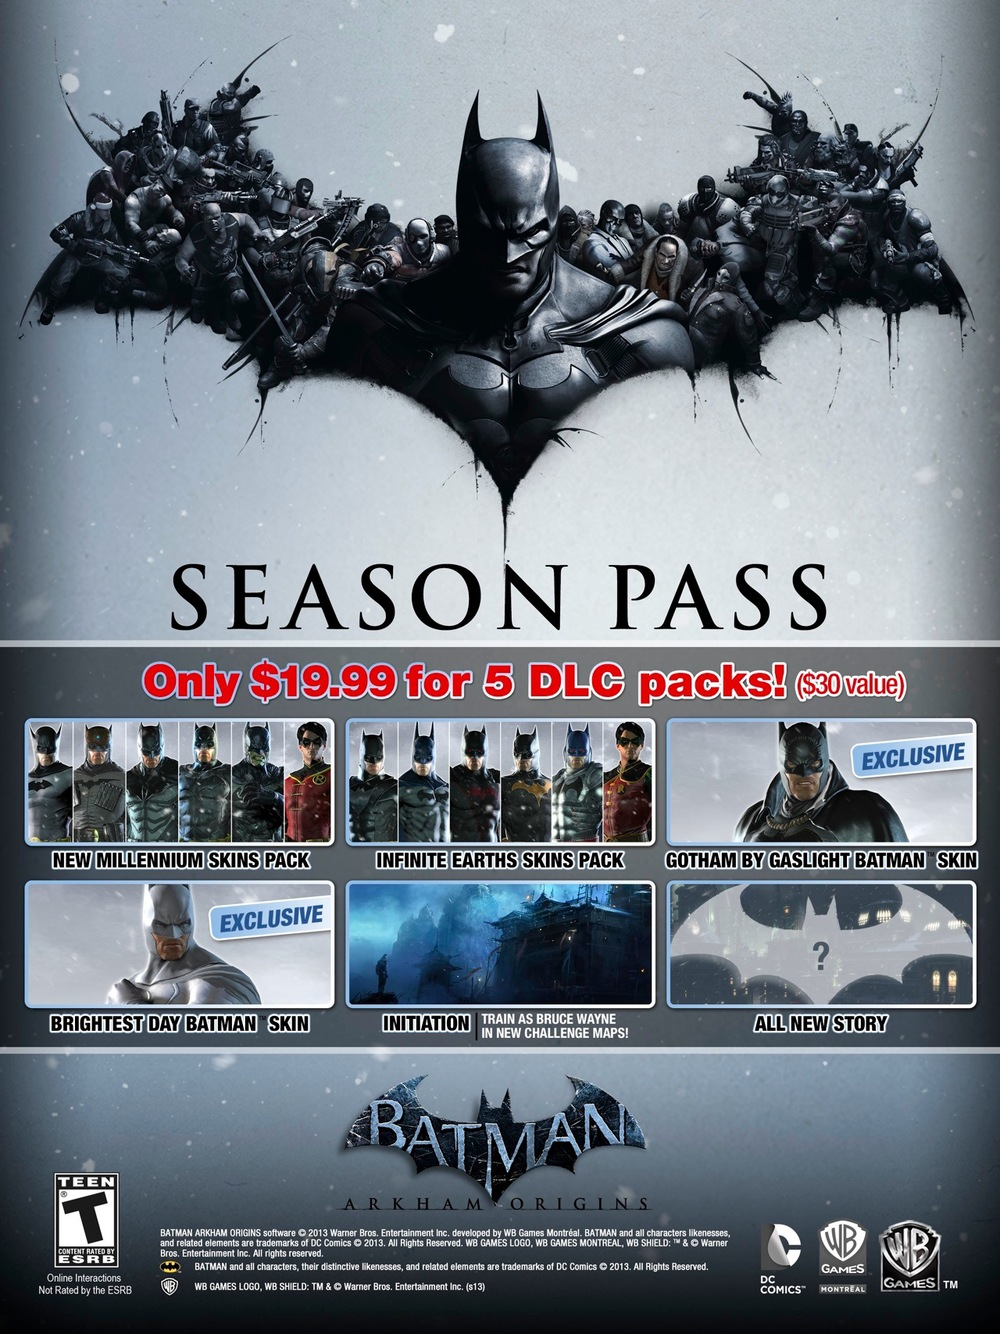 Batman_ArkhamOrigins_SeasonPass_US.jpg